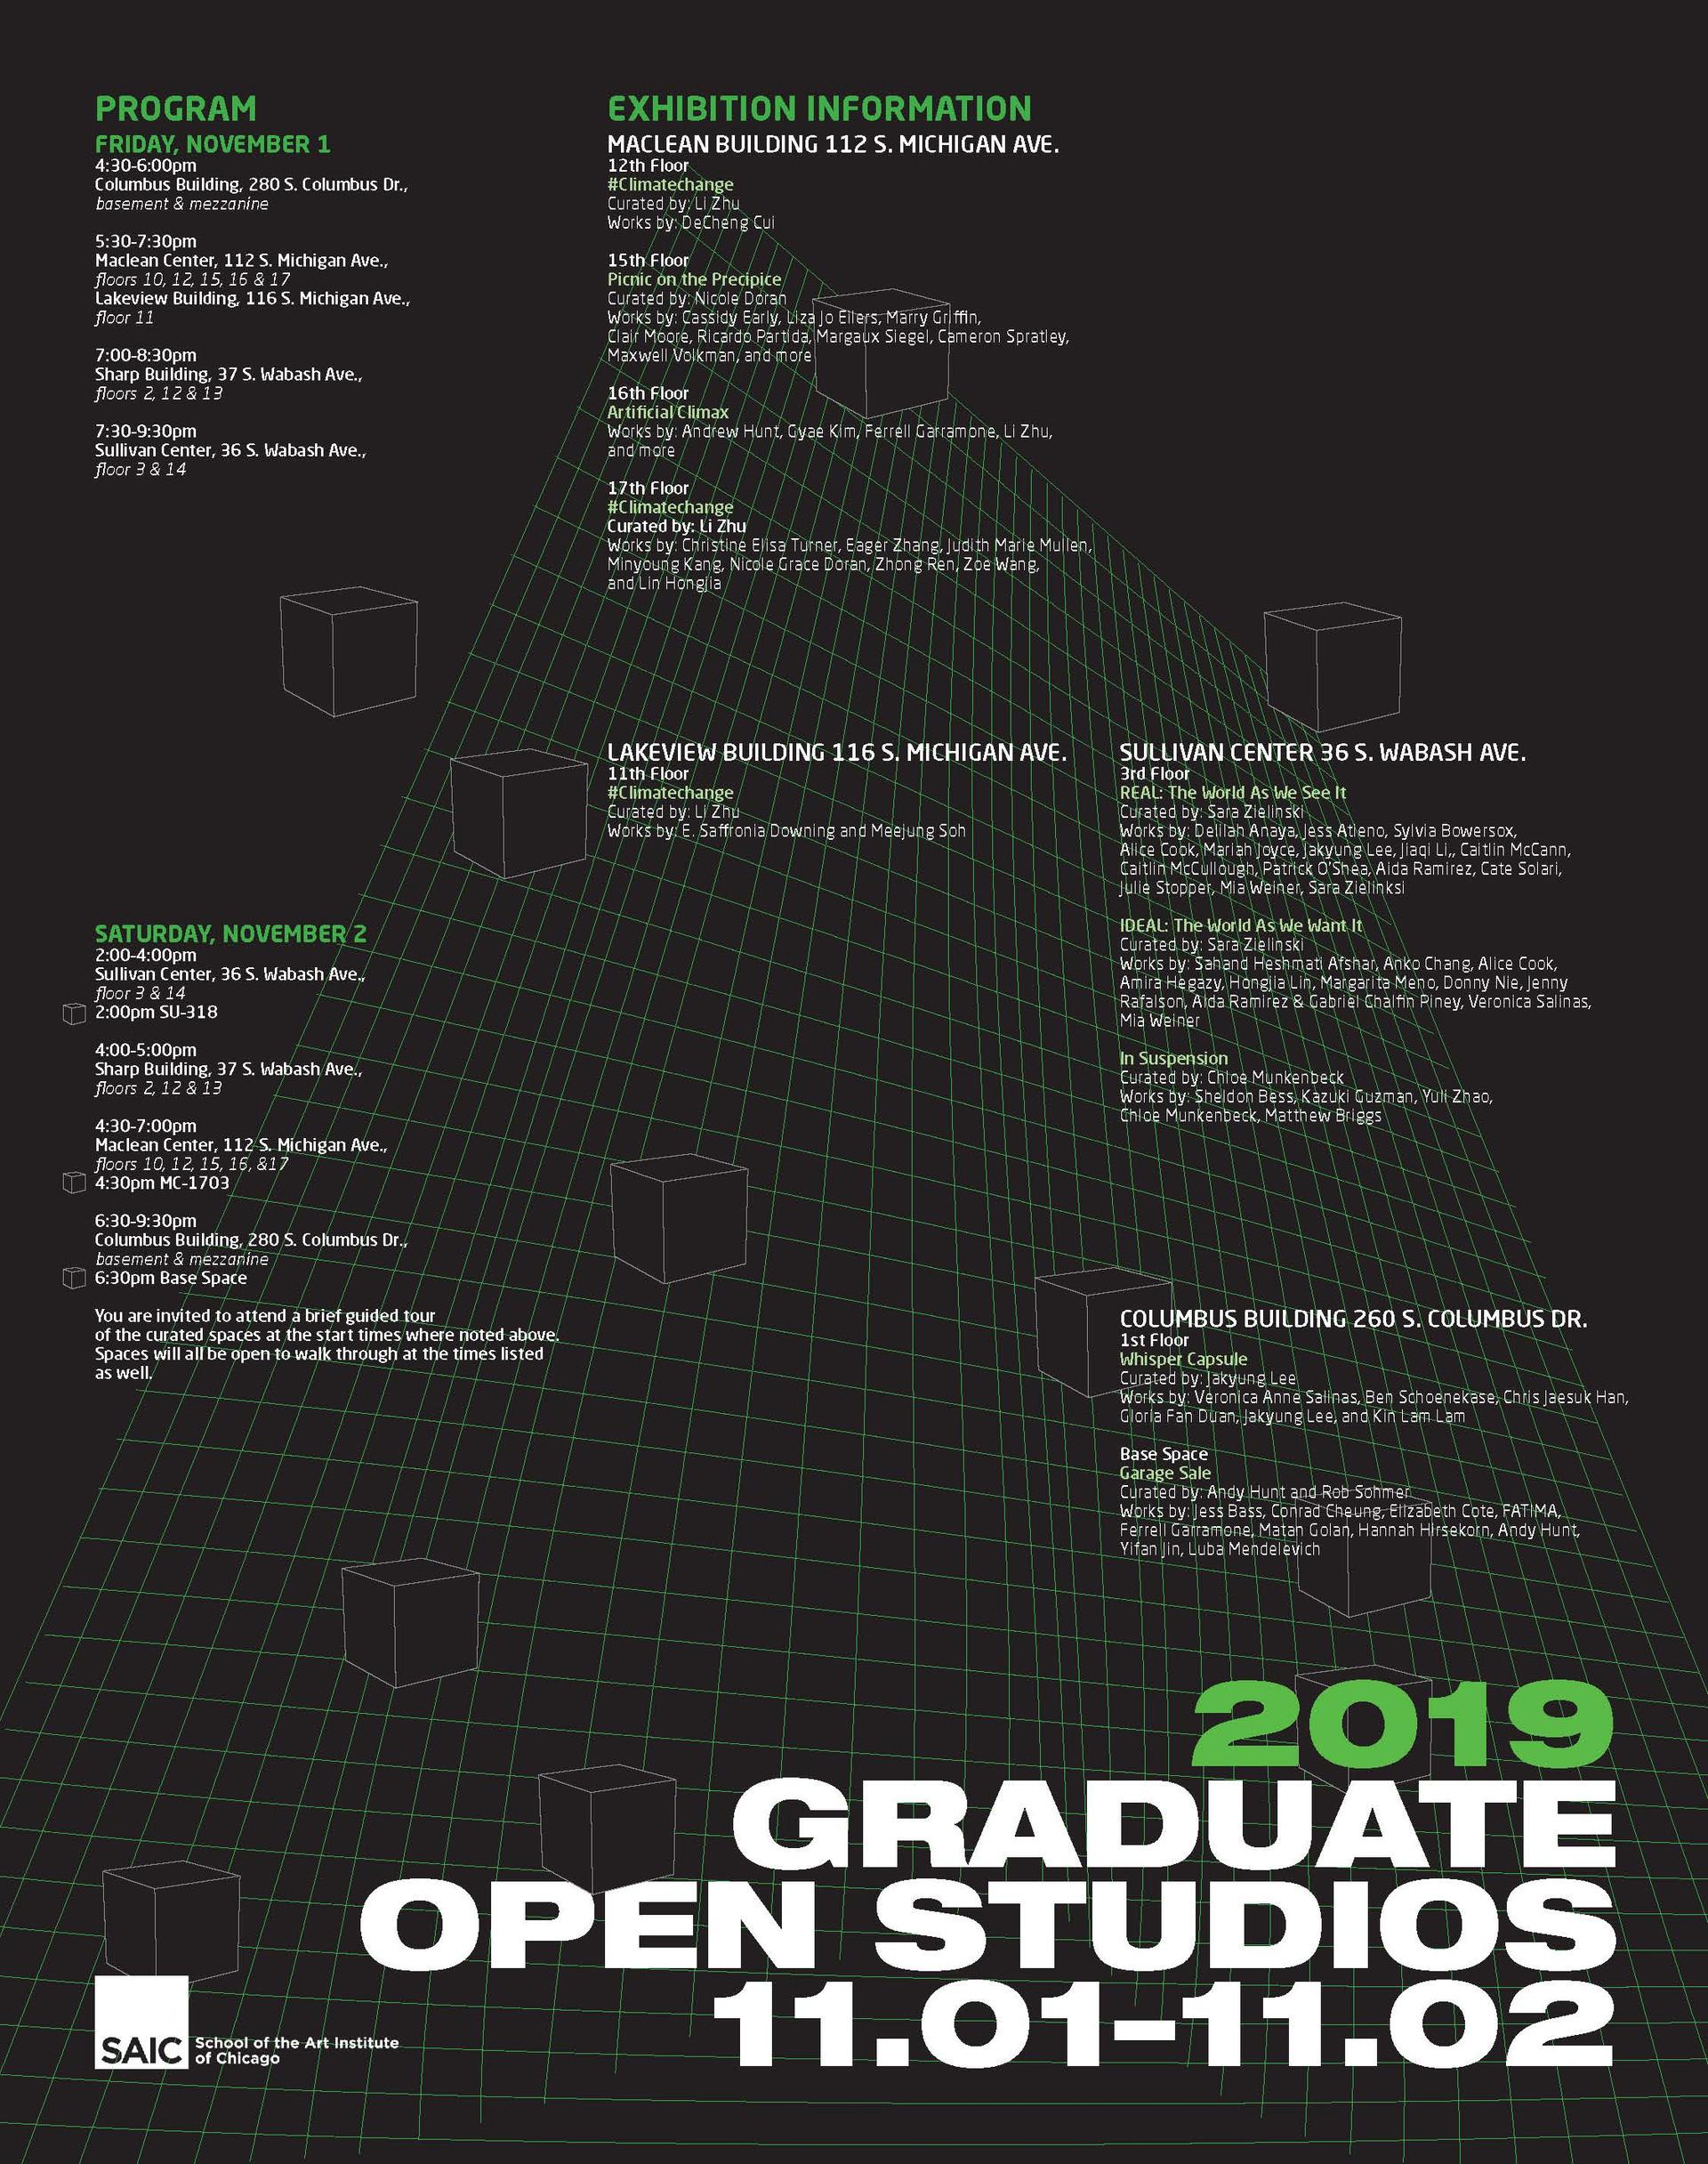 OSN-1023_RieslingD_Poster_v6_Page_3.jpg